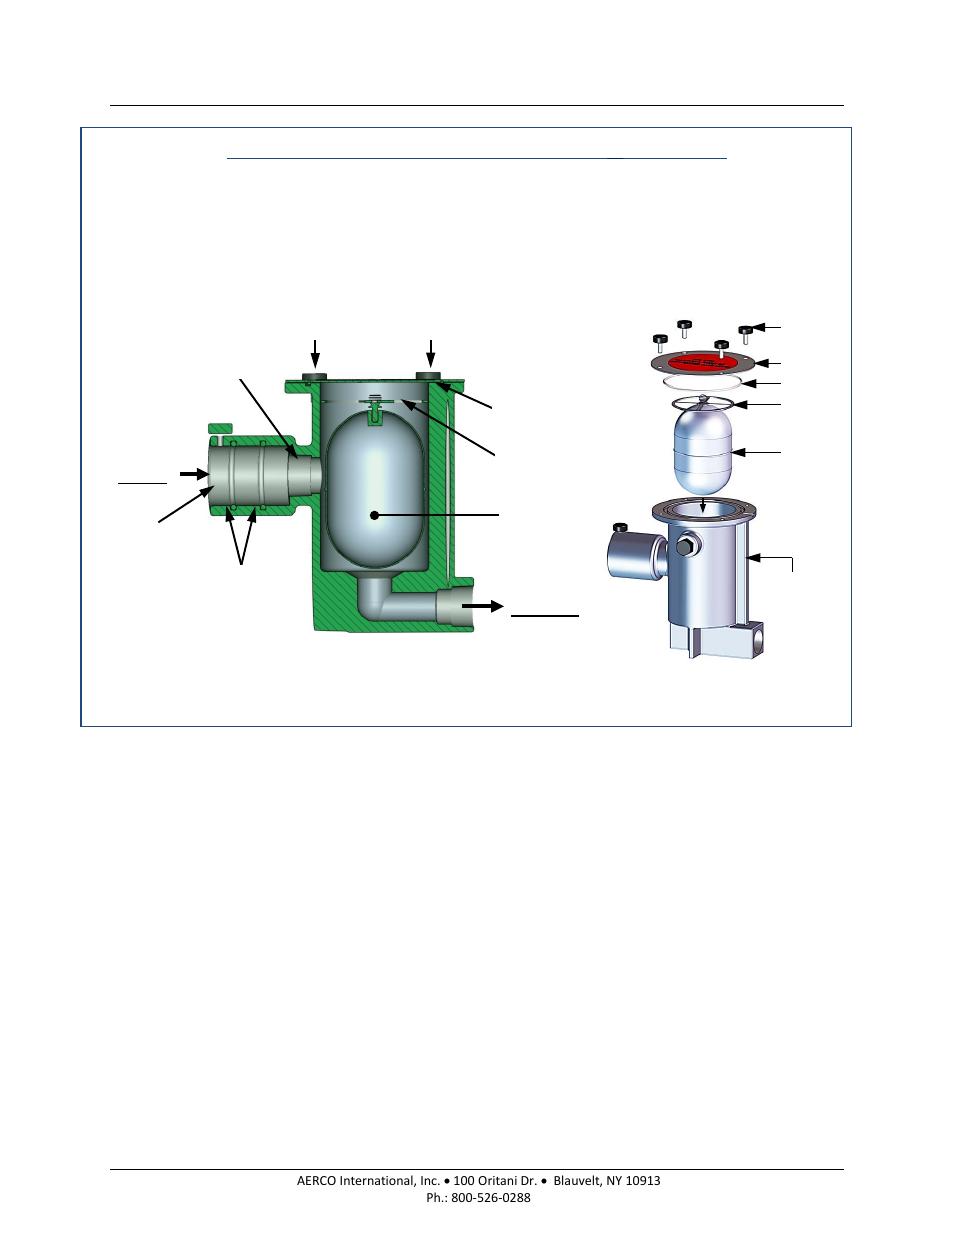 aerco bmk 1000 user manual page 97 192 also for bmk 750 rh manualsdir com Gas Water Boiler Wiring Thermostat Wiring Diagram